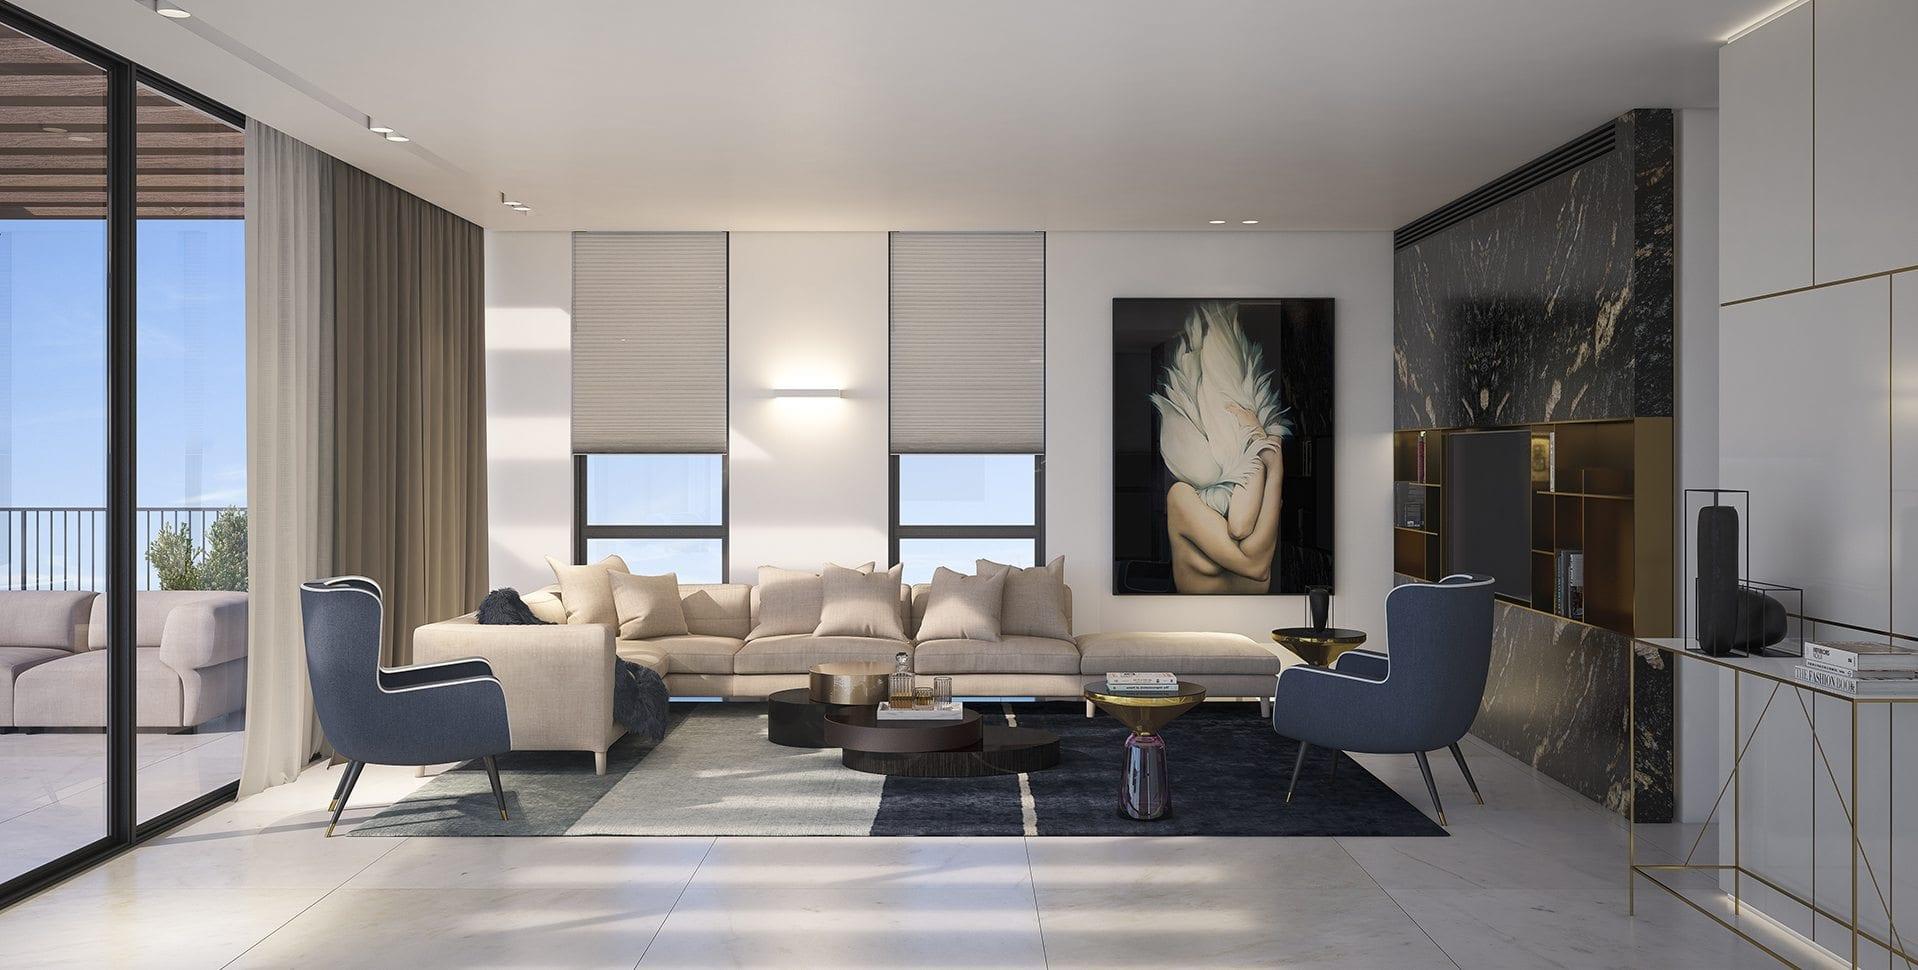 Maayan-Golan_Architectural-Visualization_ apartment-yehuda-halevi-tel-aviv_interior-visualization_living-room_design-ws-studio_02